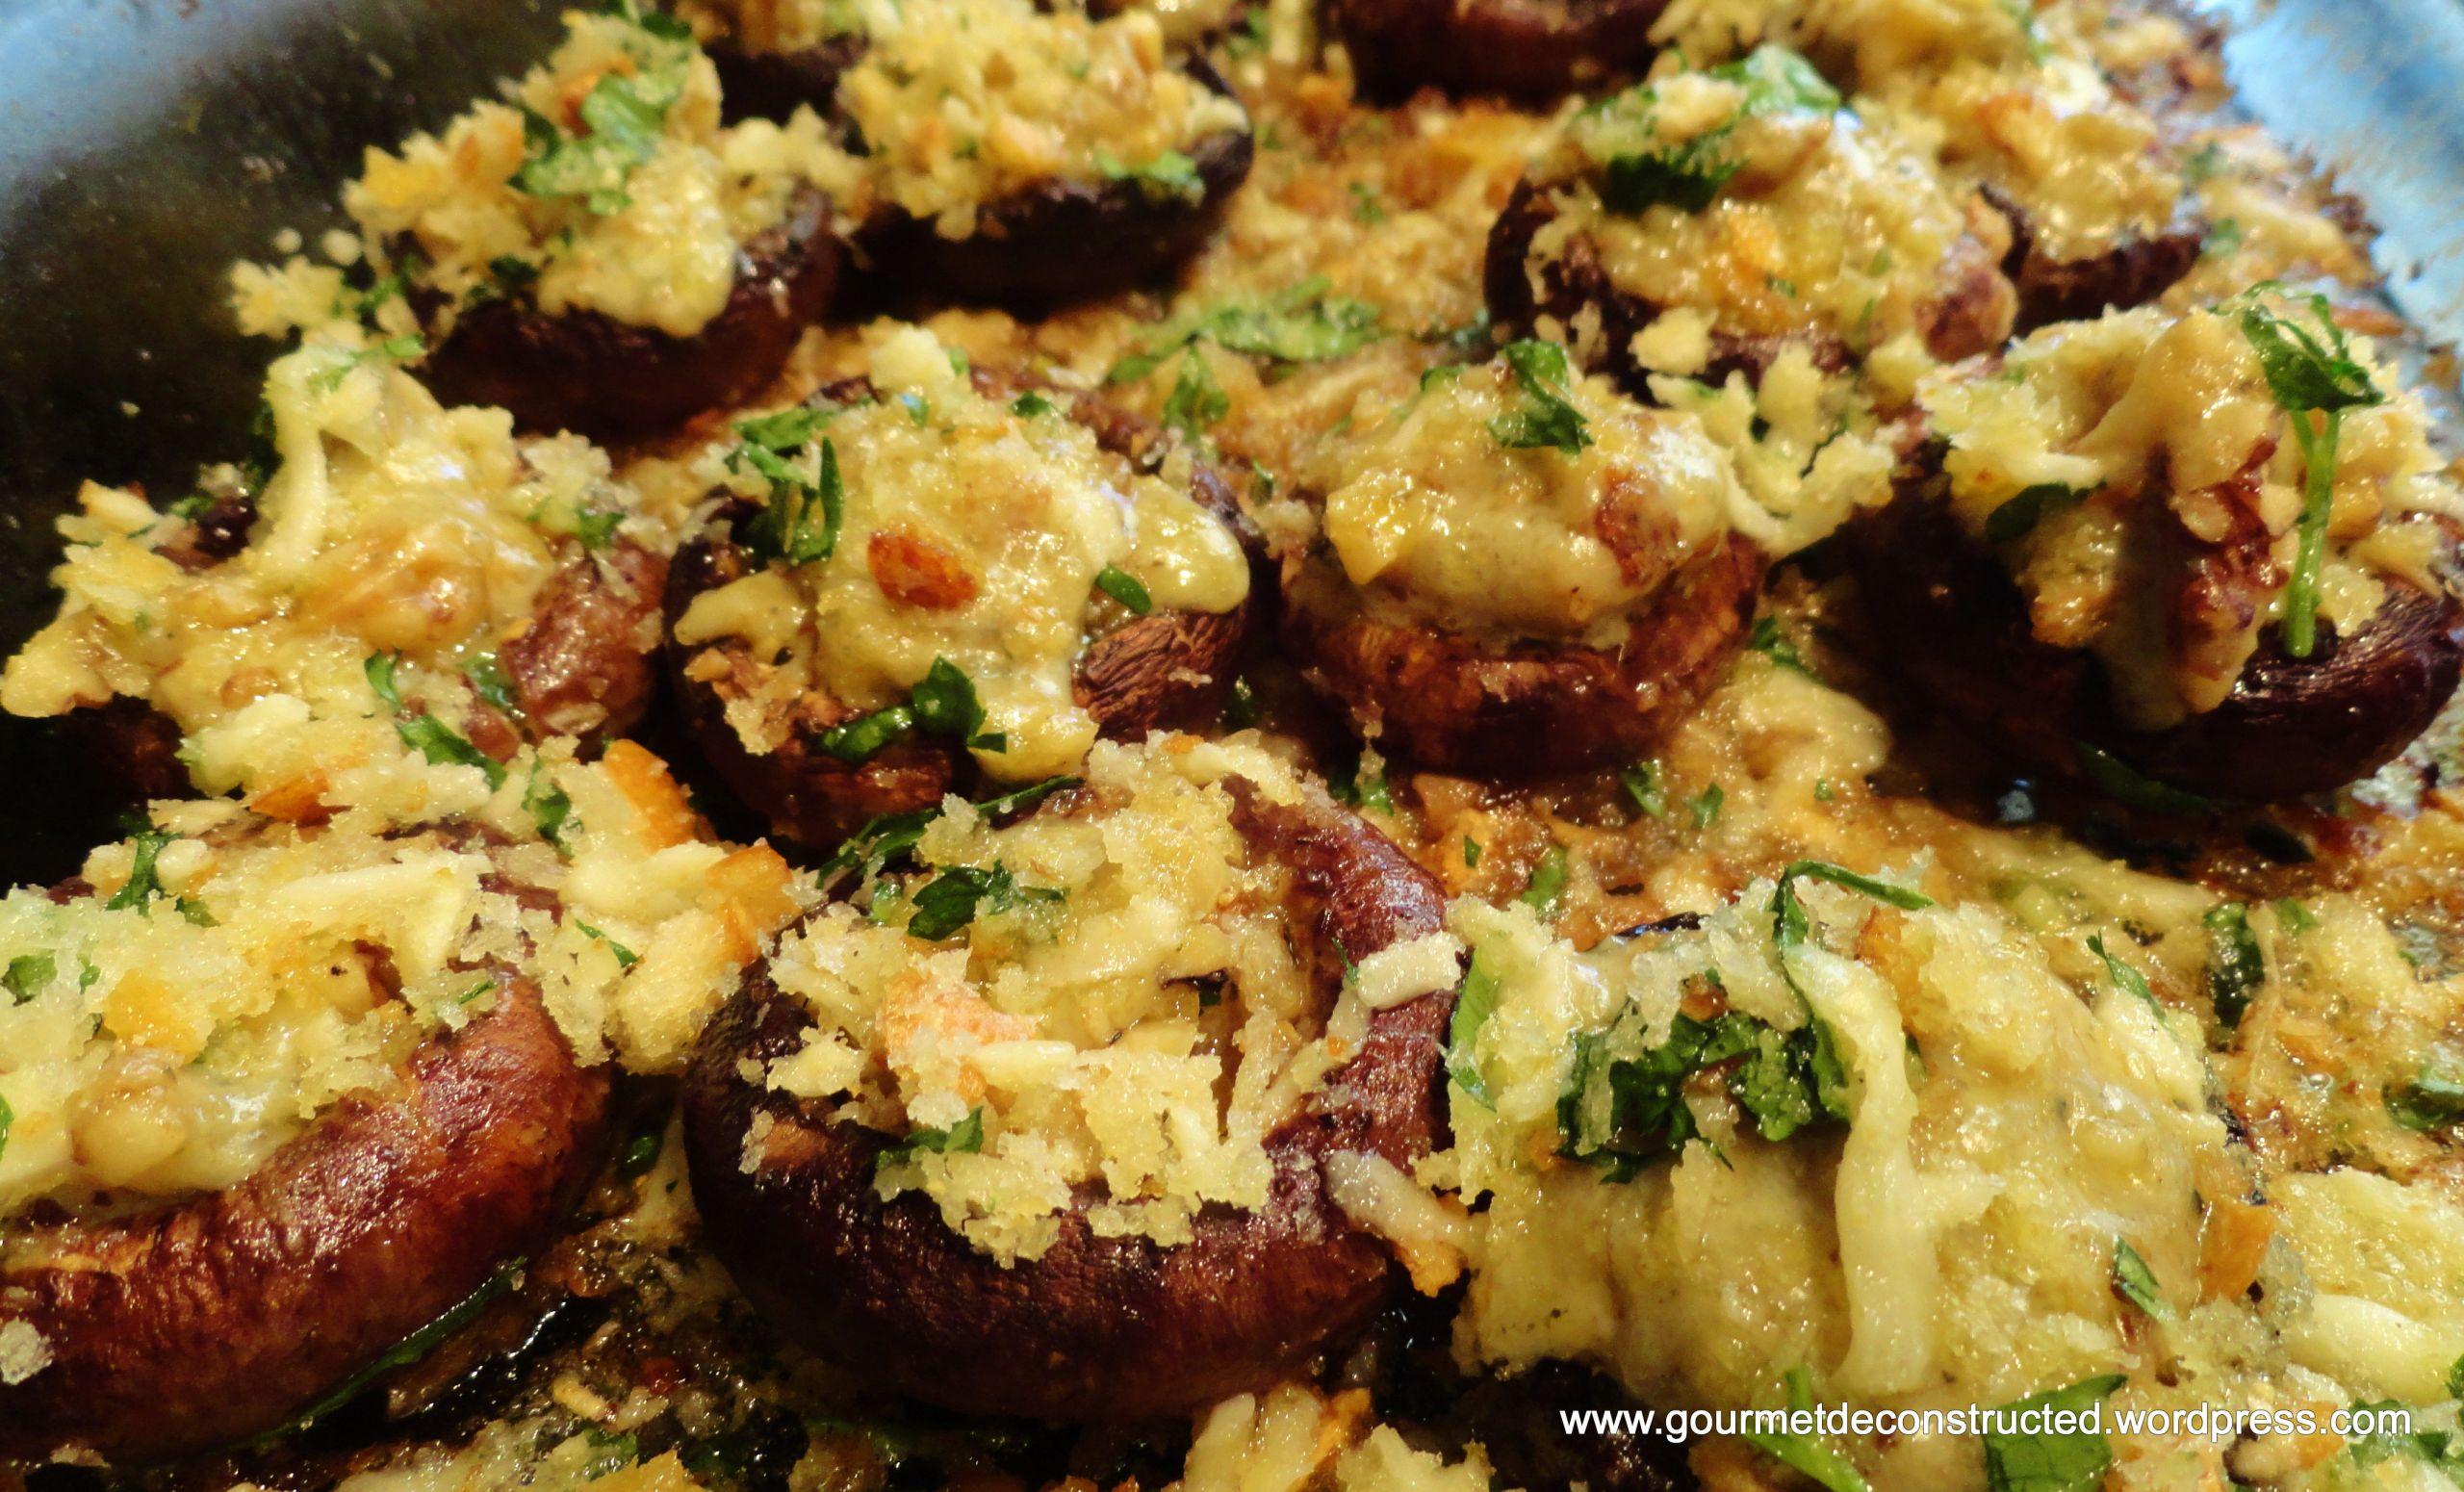 Baby Bella Mushrooms Recipes  Meatless Mondays Baked Stilton Walnut Stuffed Baby Bella